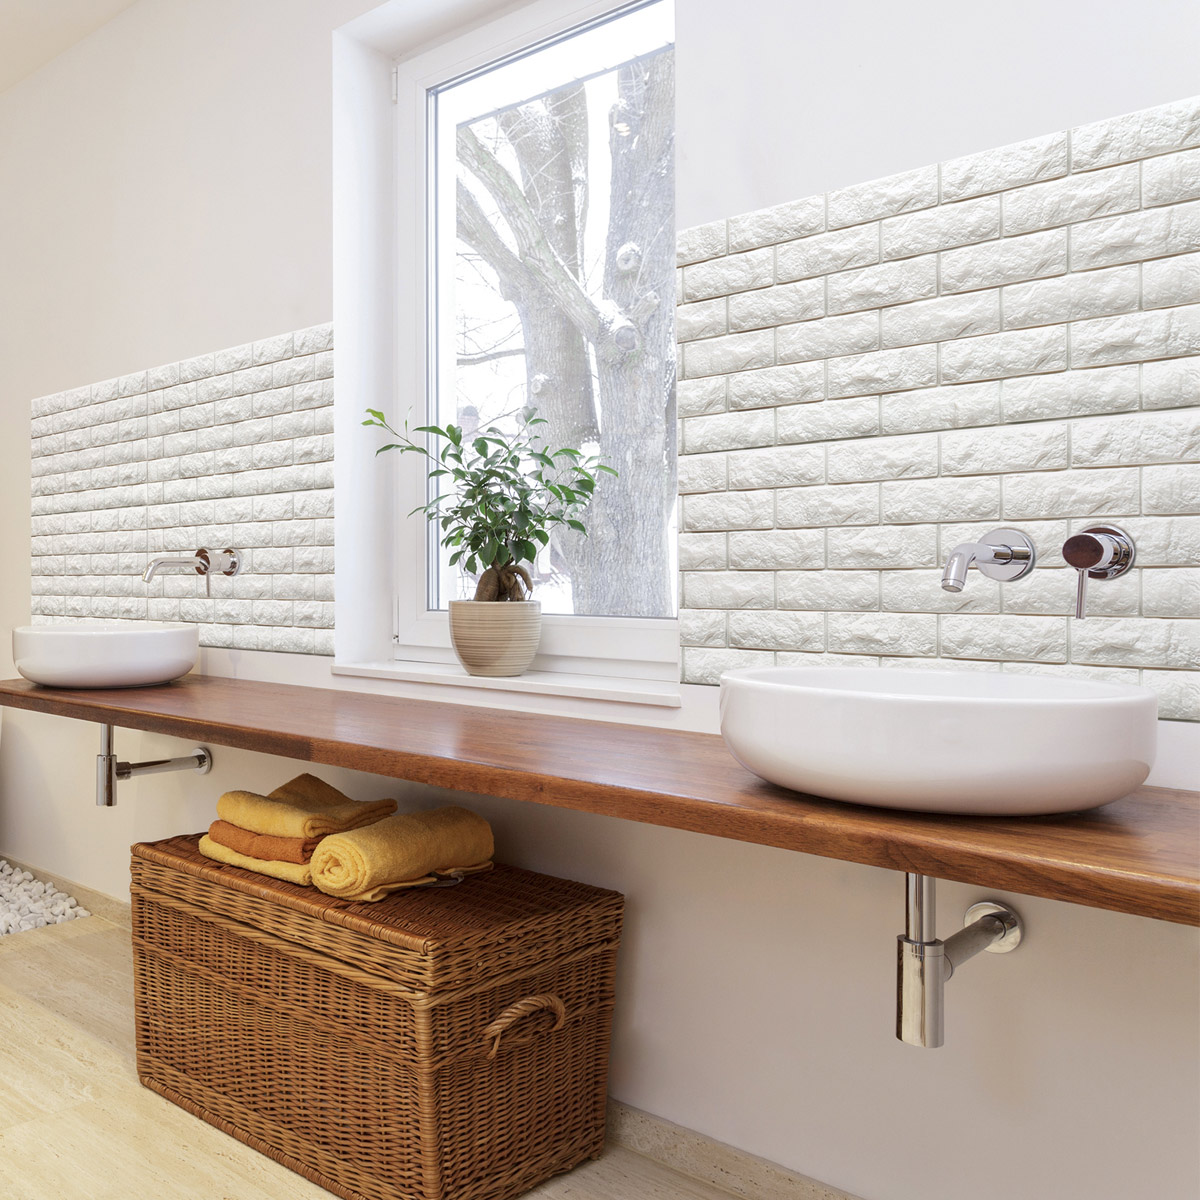 A06501 Peel Stick 3d Wall Panels Foam Block Brick 3d Wall